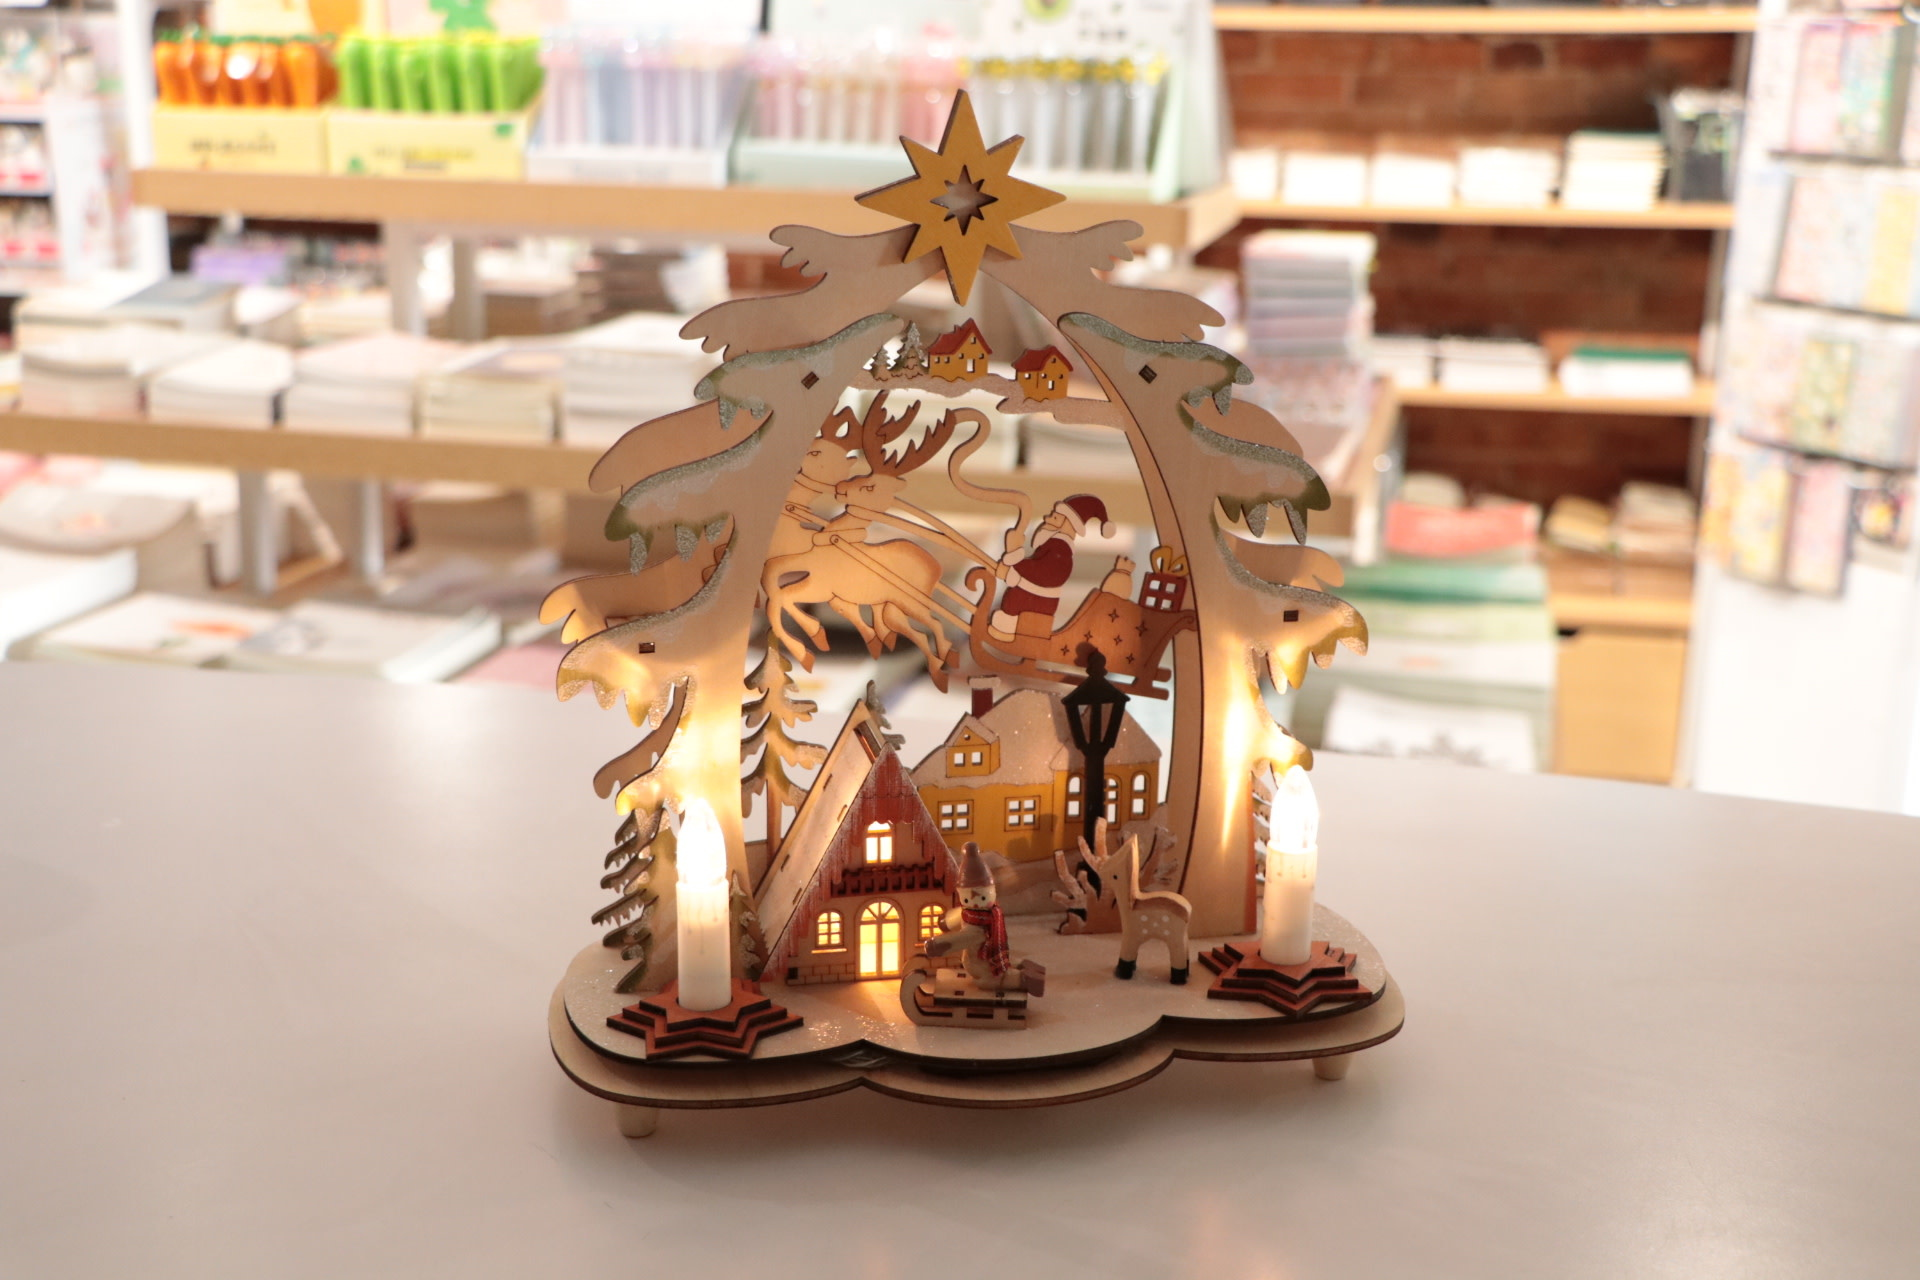 12x9 Laser Cut Light Up Santa/Deer Scene